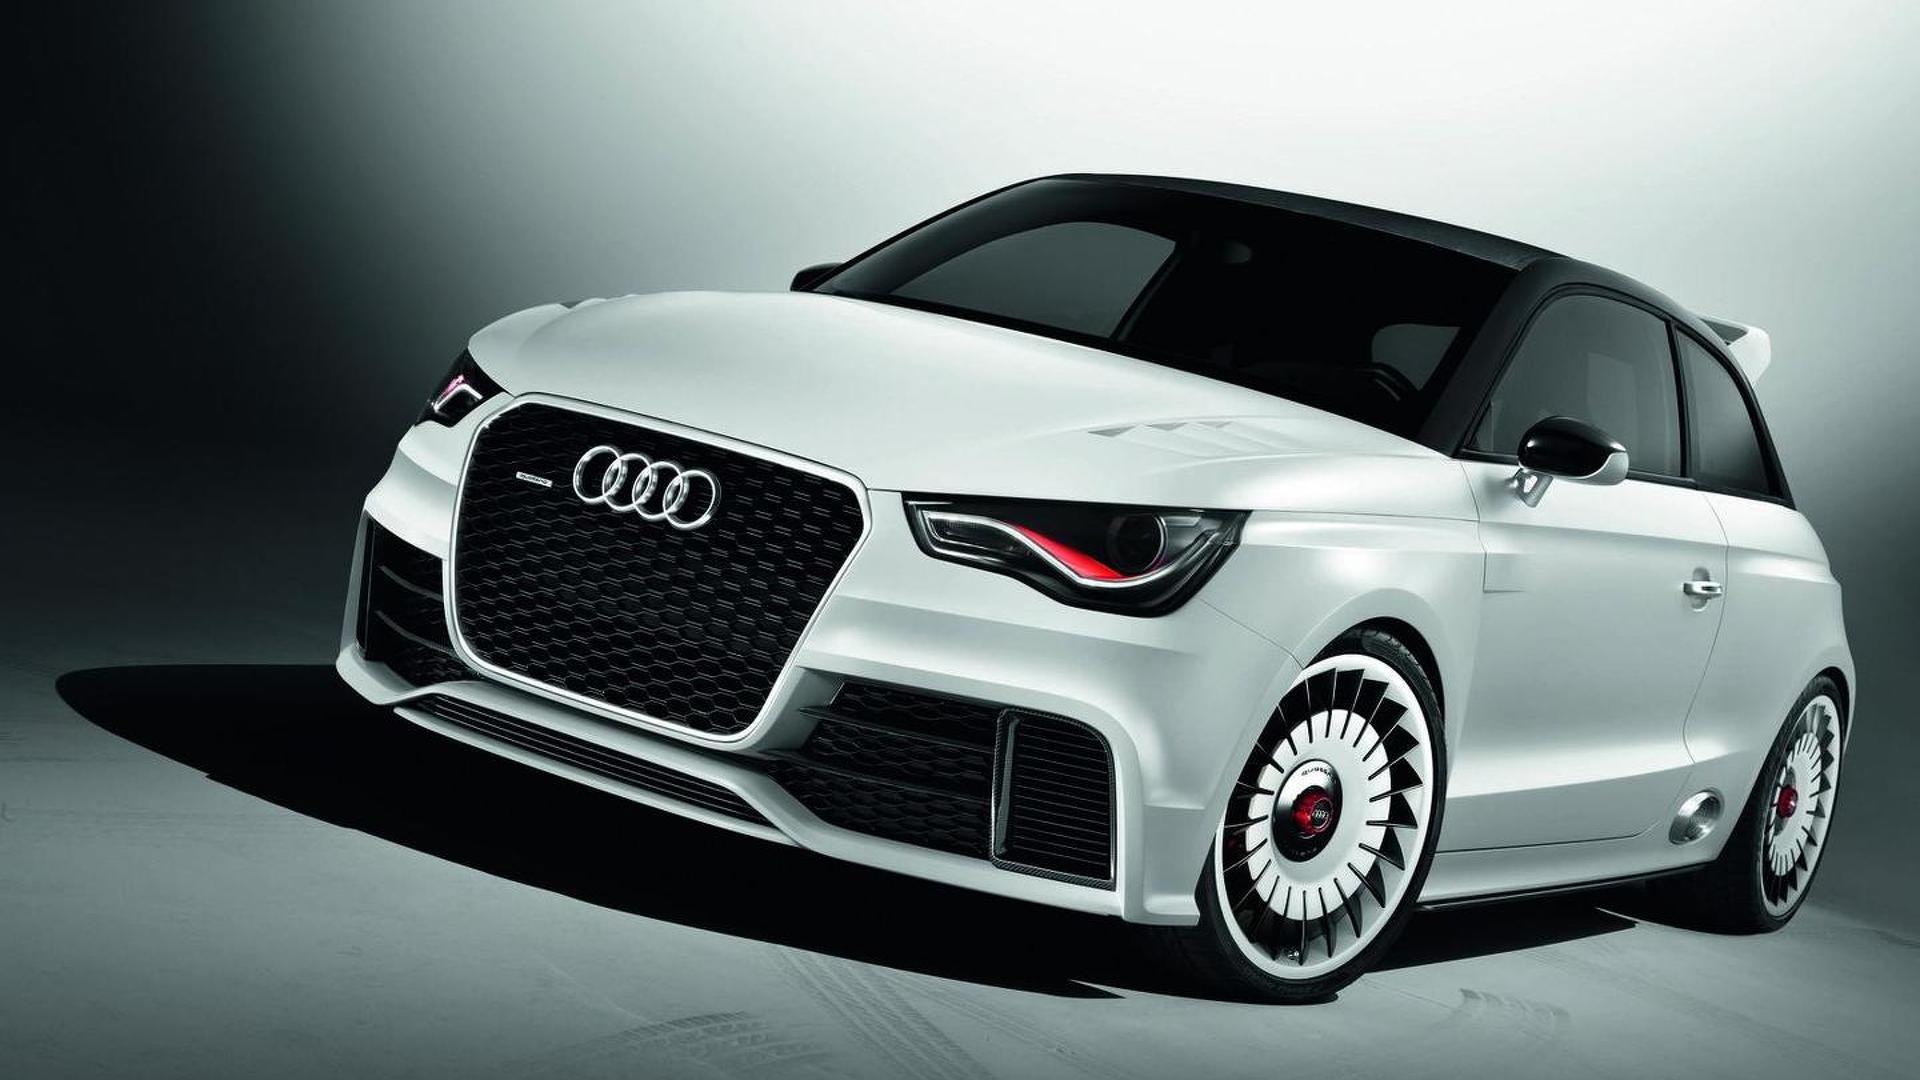 NFS World Audi A1 Clubsport Quattro special [video]